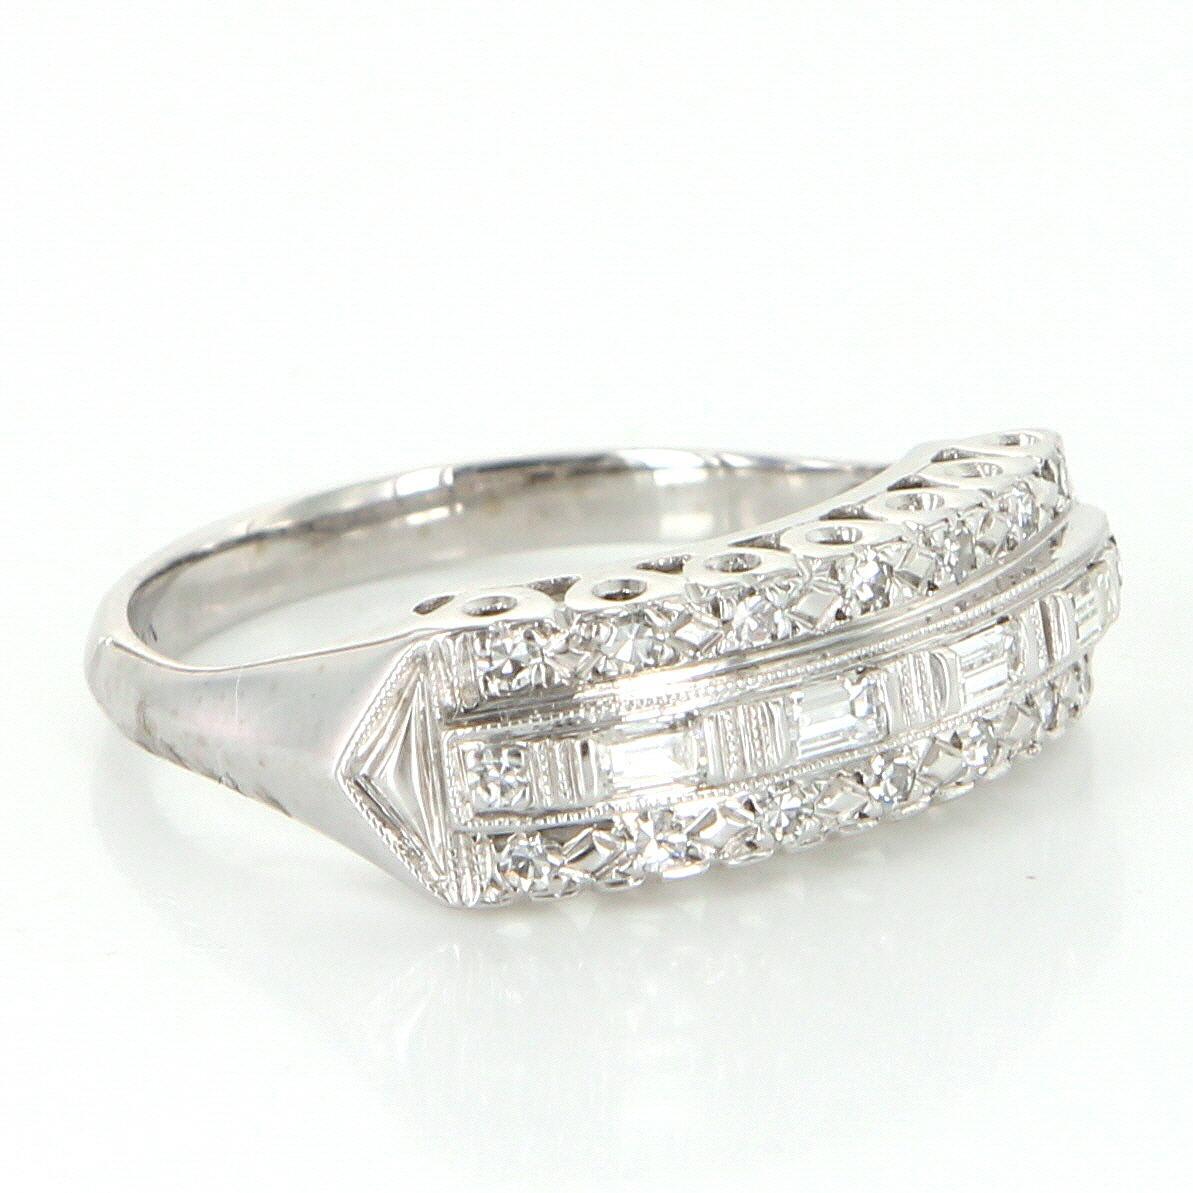 vintage art deco diamond anniversary ring 14 karat white. Black Bedroom Furniture Sets. Home Design Ideas